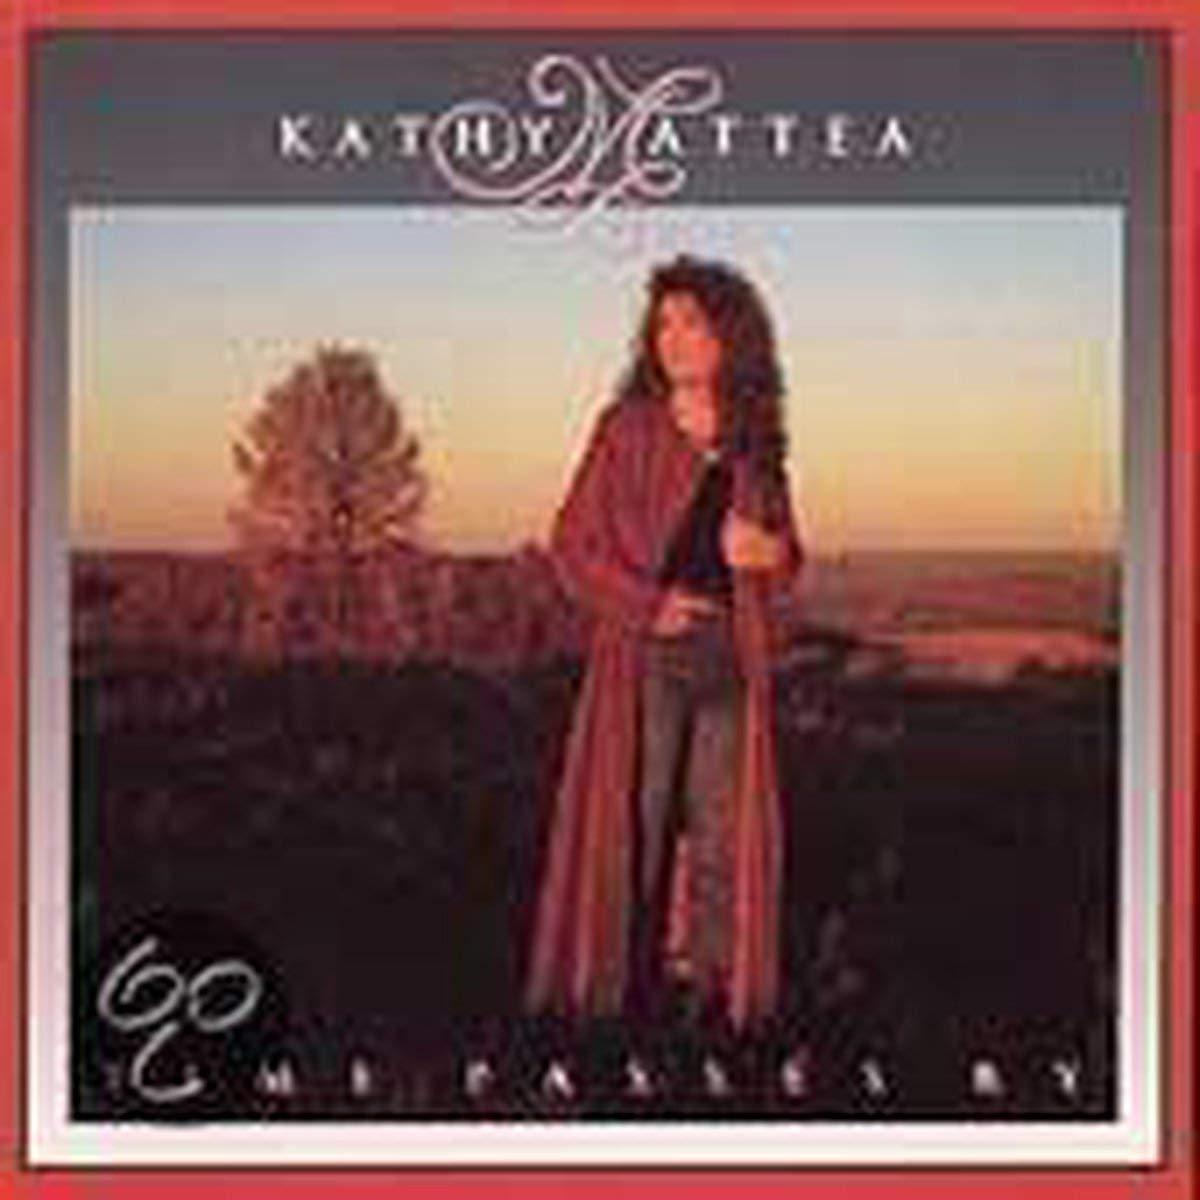 Kathy Mattea – Time Passes By (1991) [FLAC]